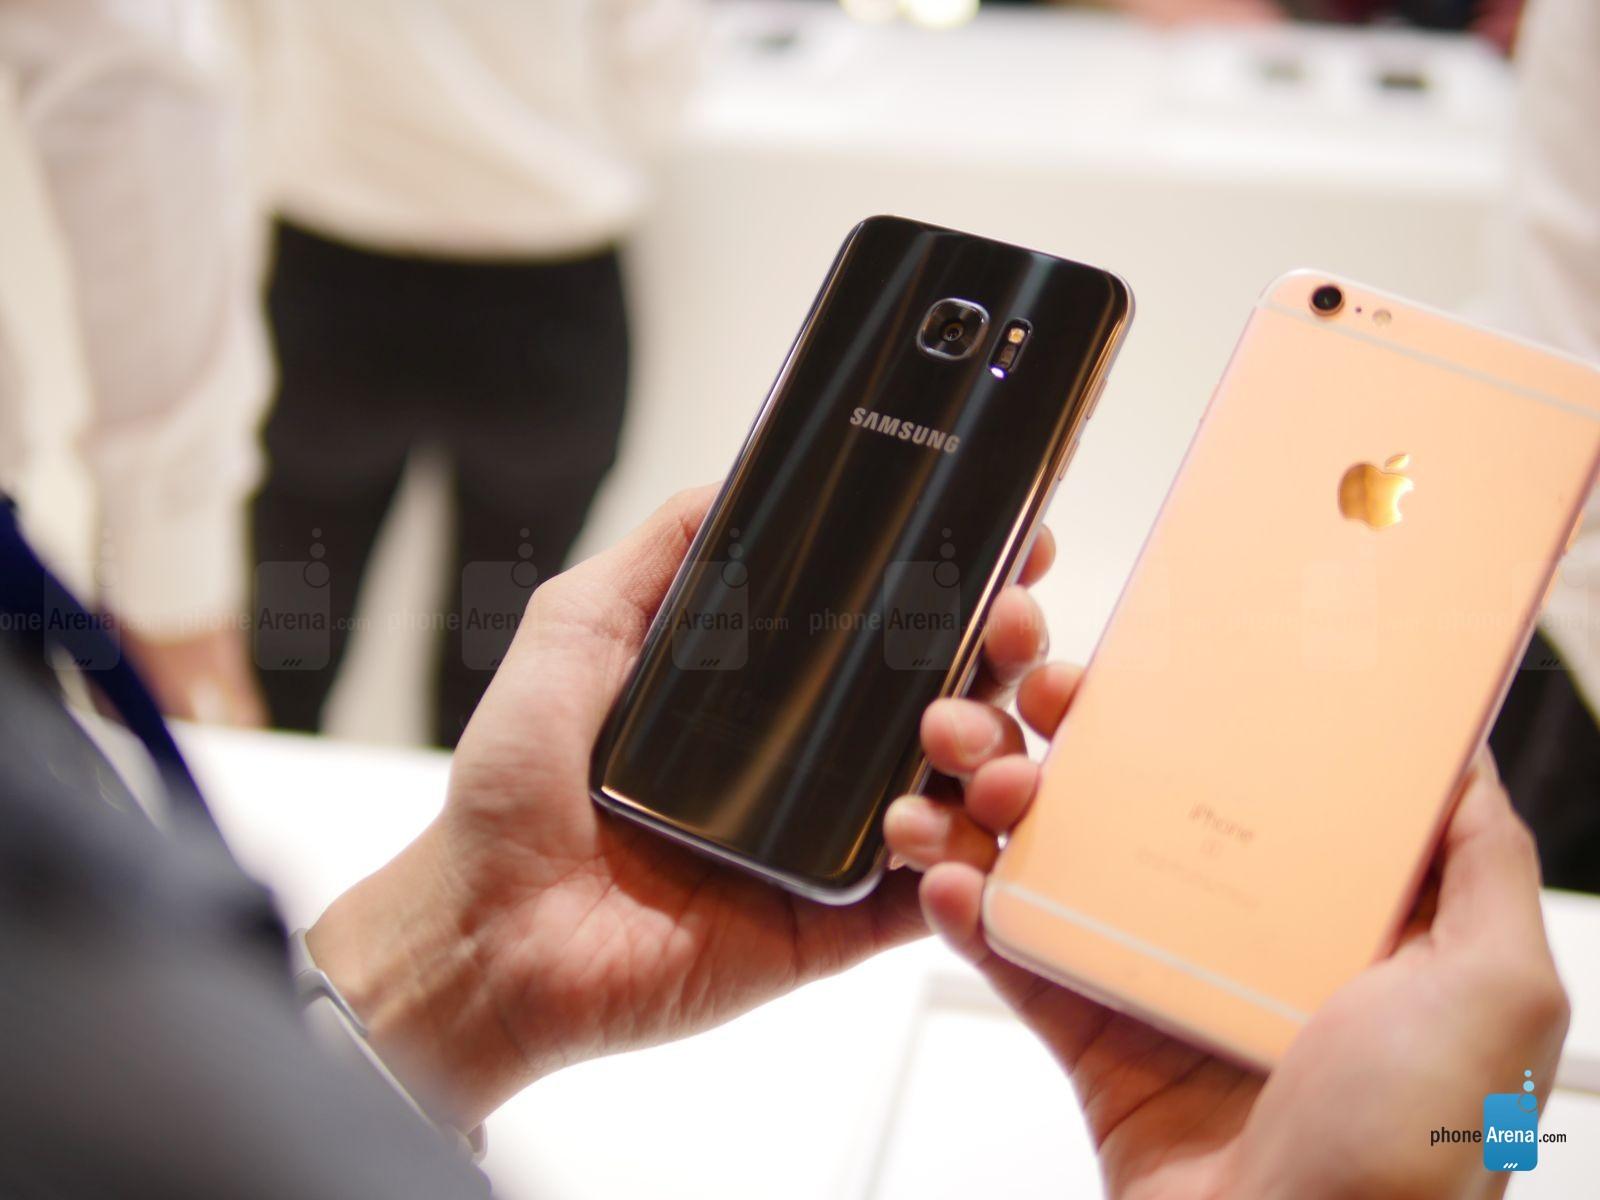 Samsung-Galaxy-S7-edge-vs-Apple-iPhon--e-6s-Plus